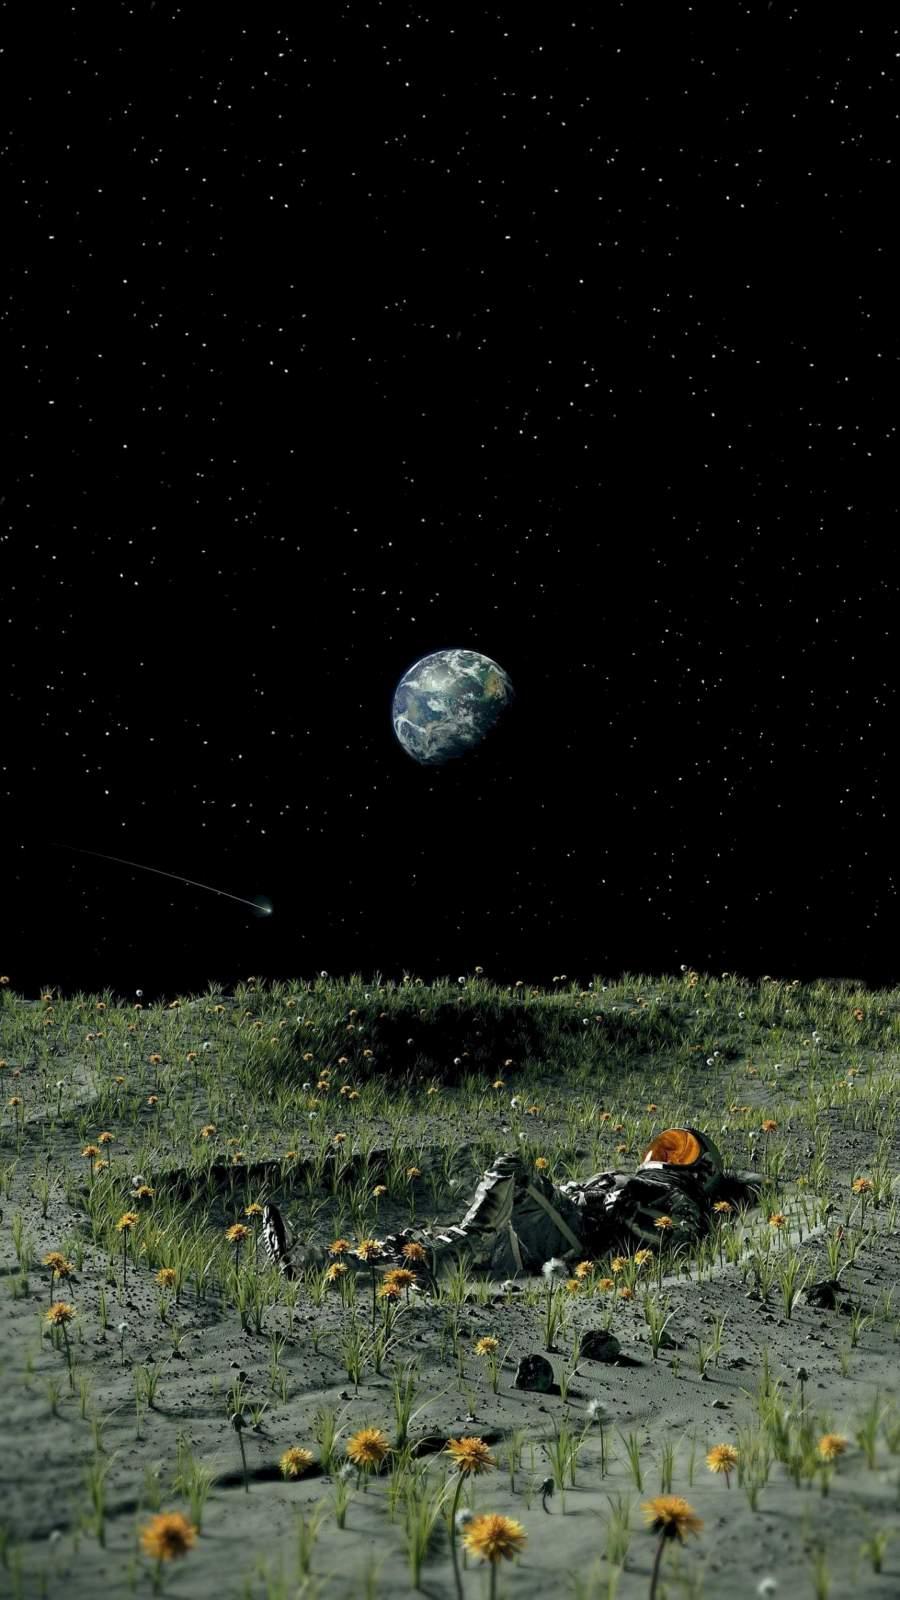 Moon Garden Astronaut